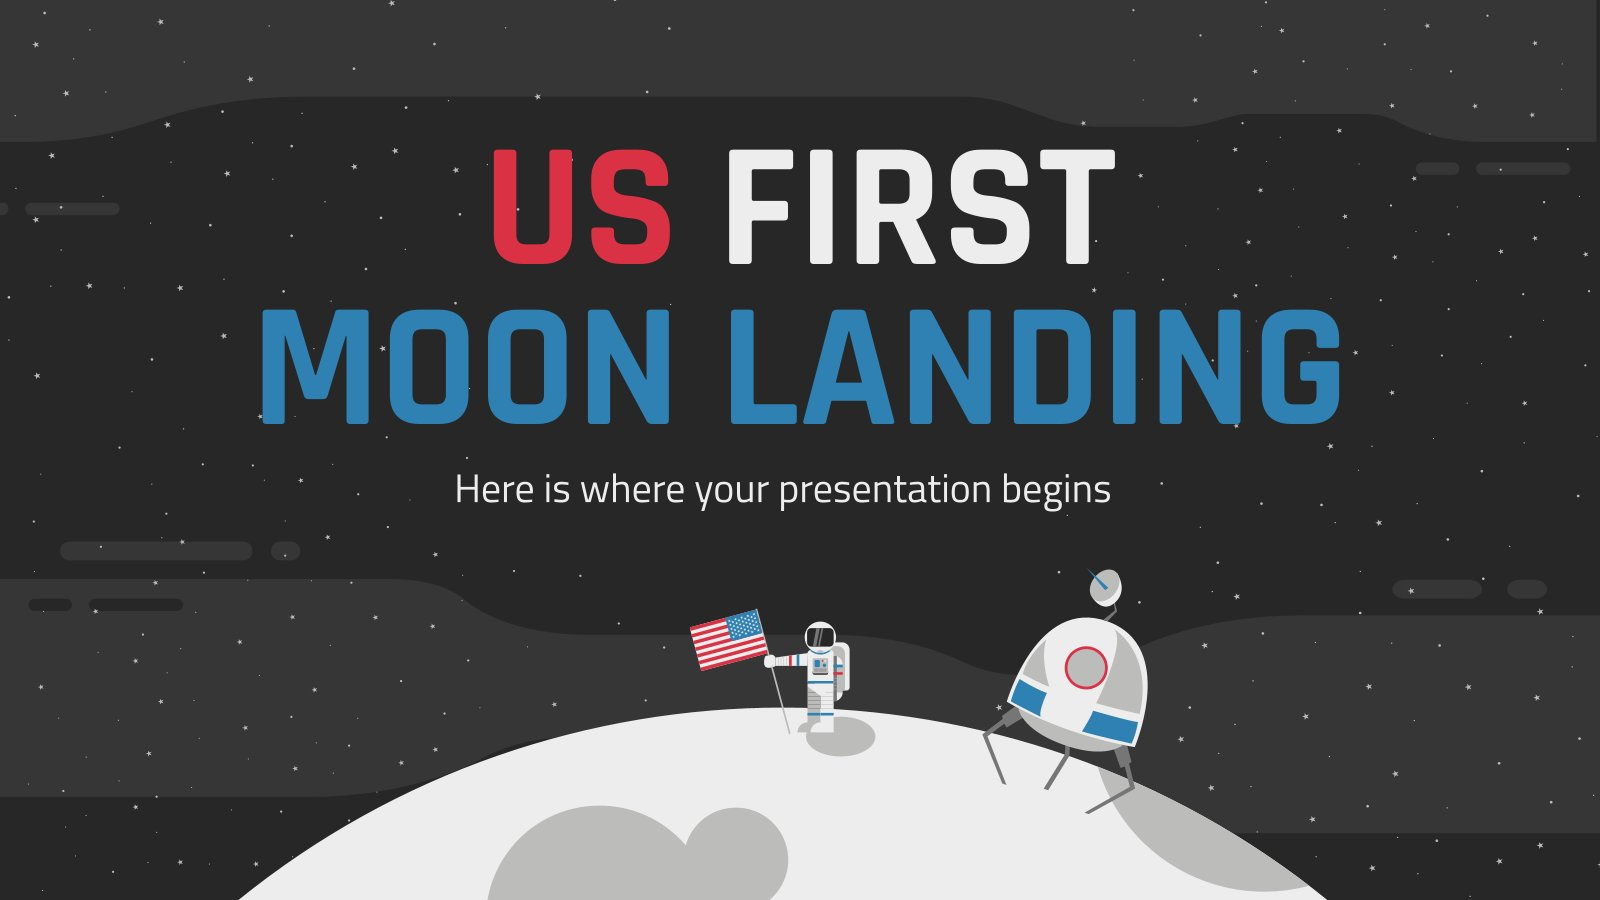 US First Moon Landing presentation template